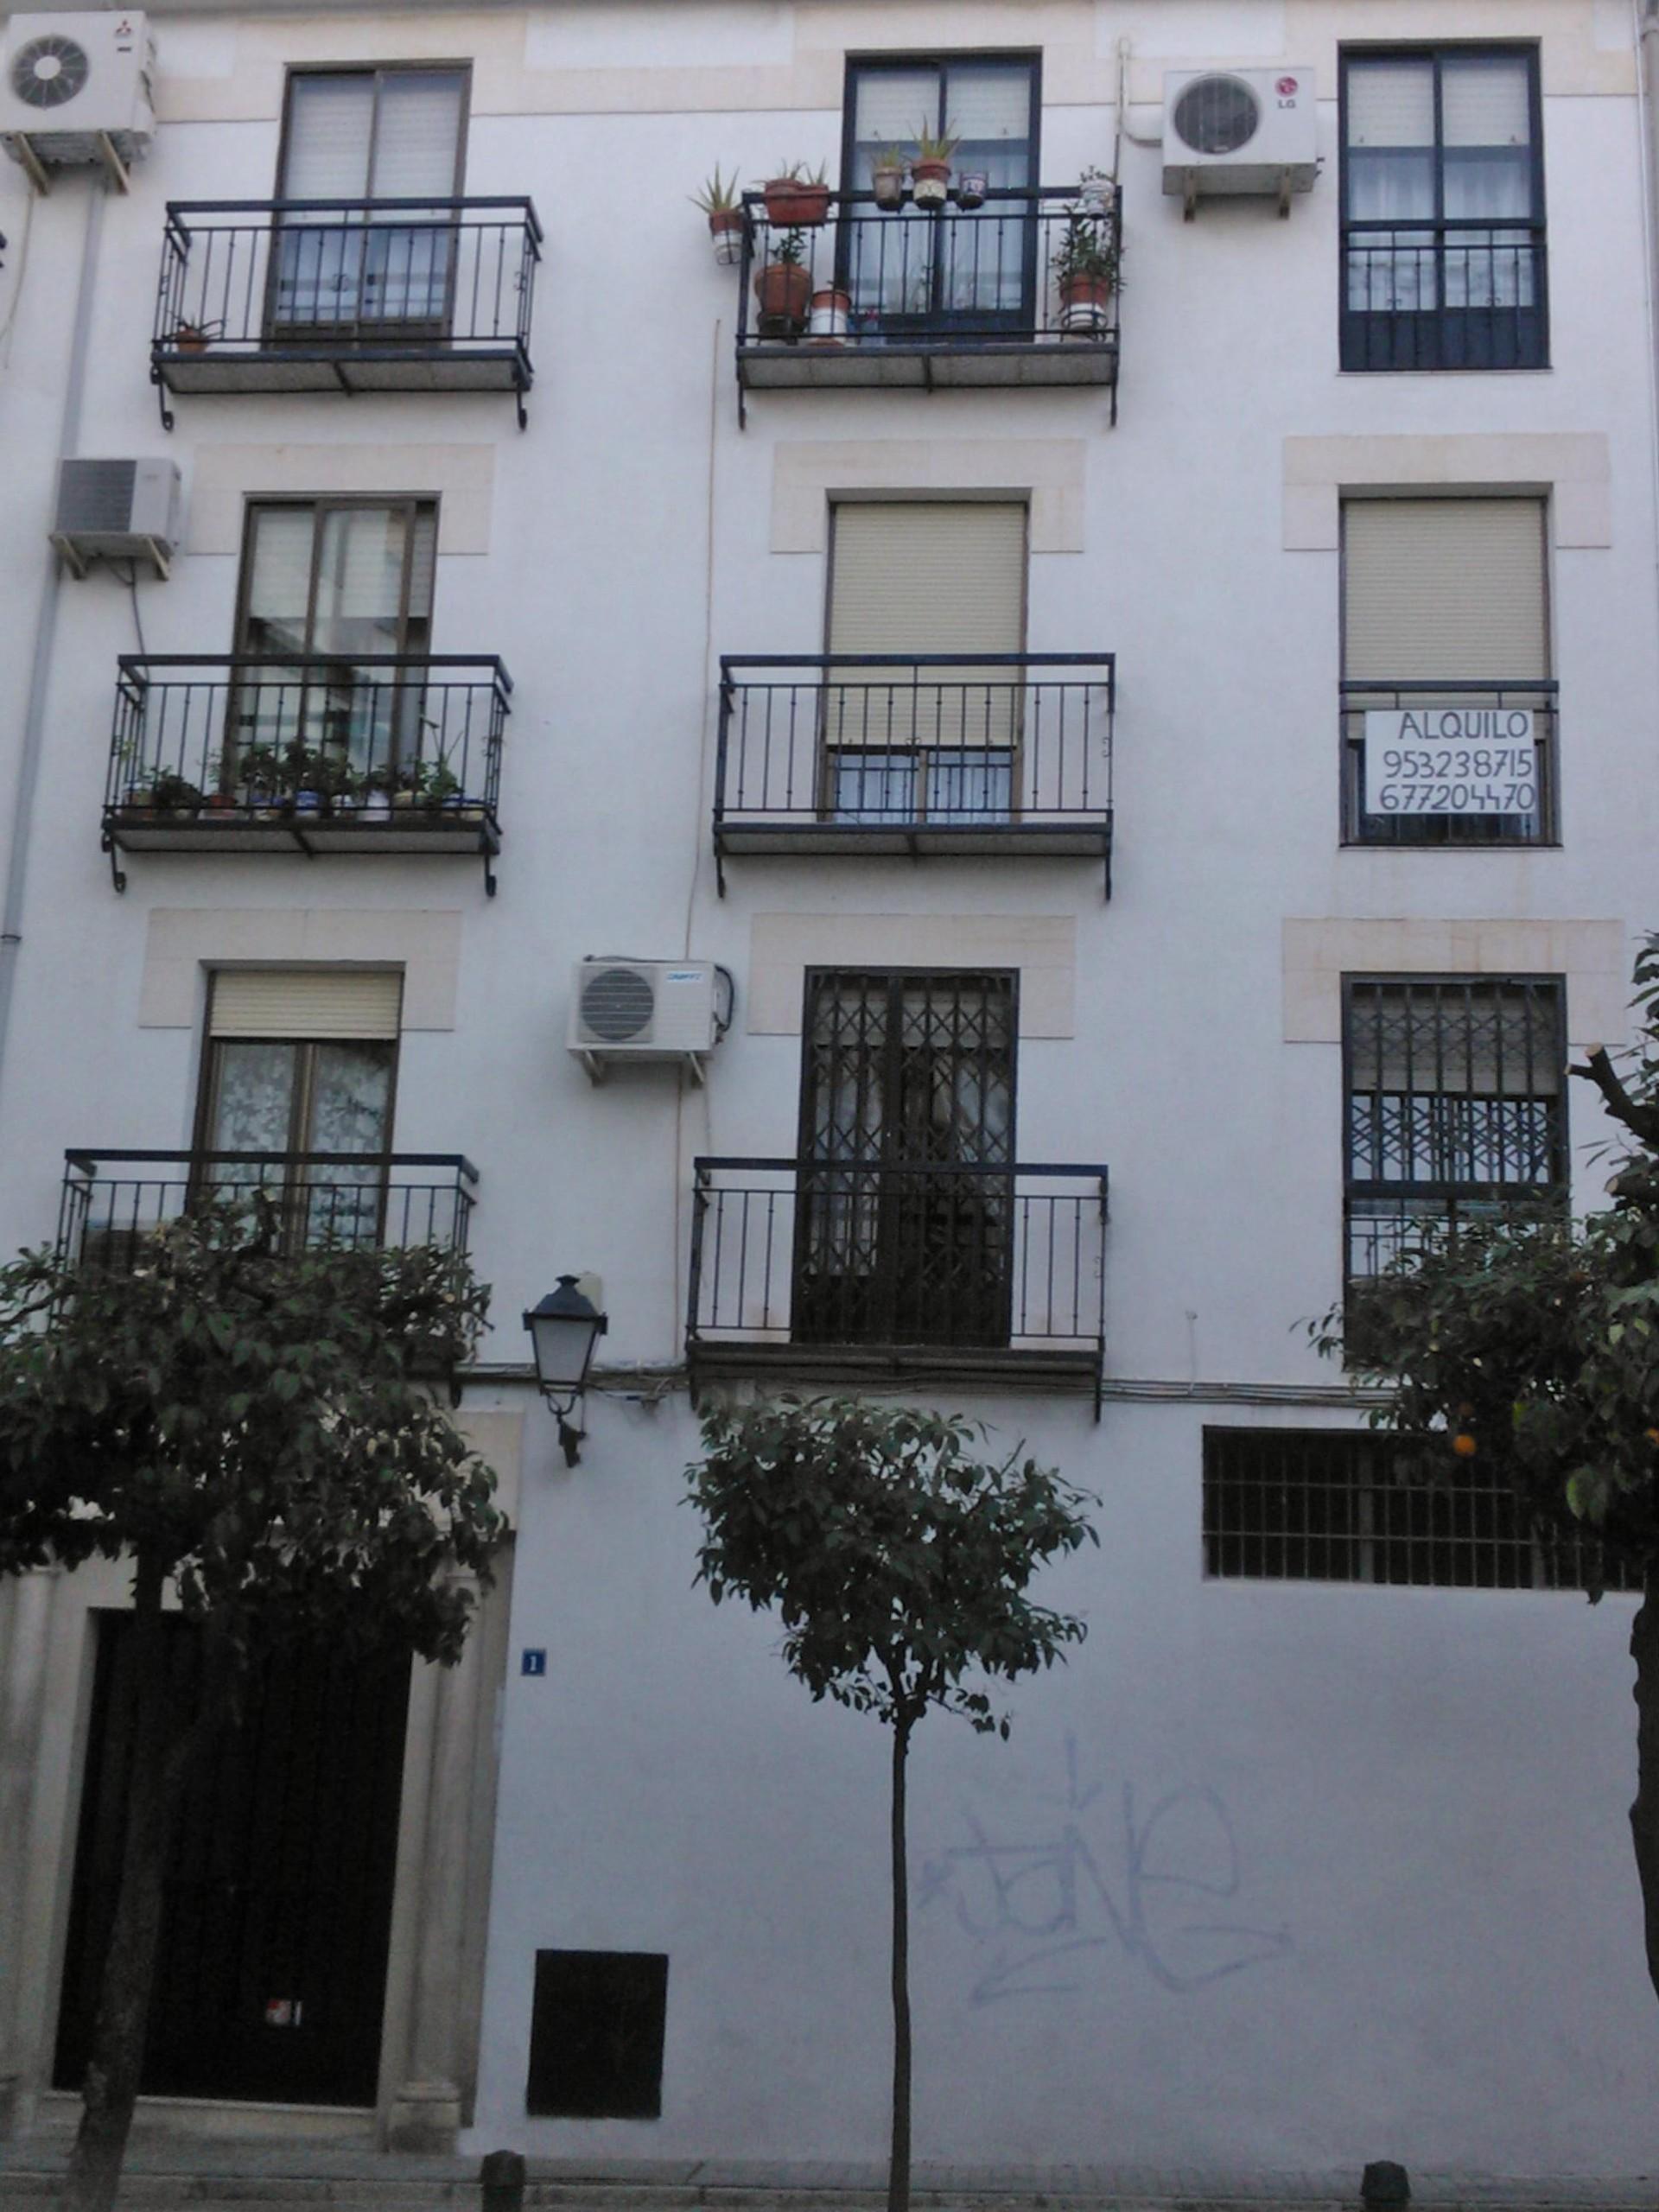 Piso en centro de jaen bien comunicado alquiler for Alquiler de pisos en jaen